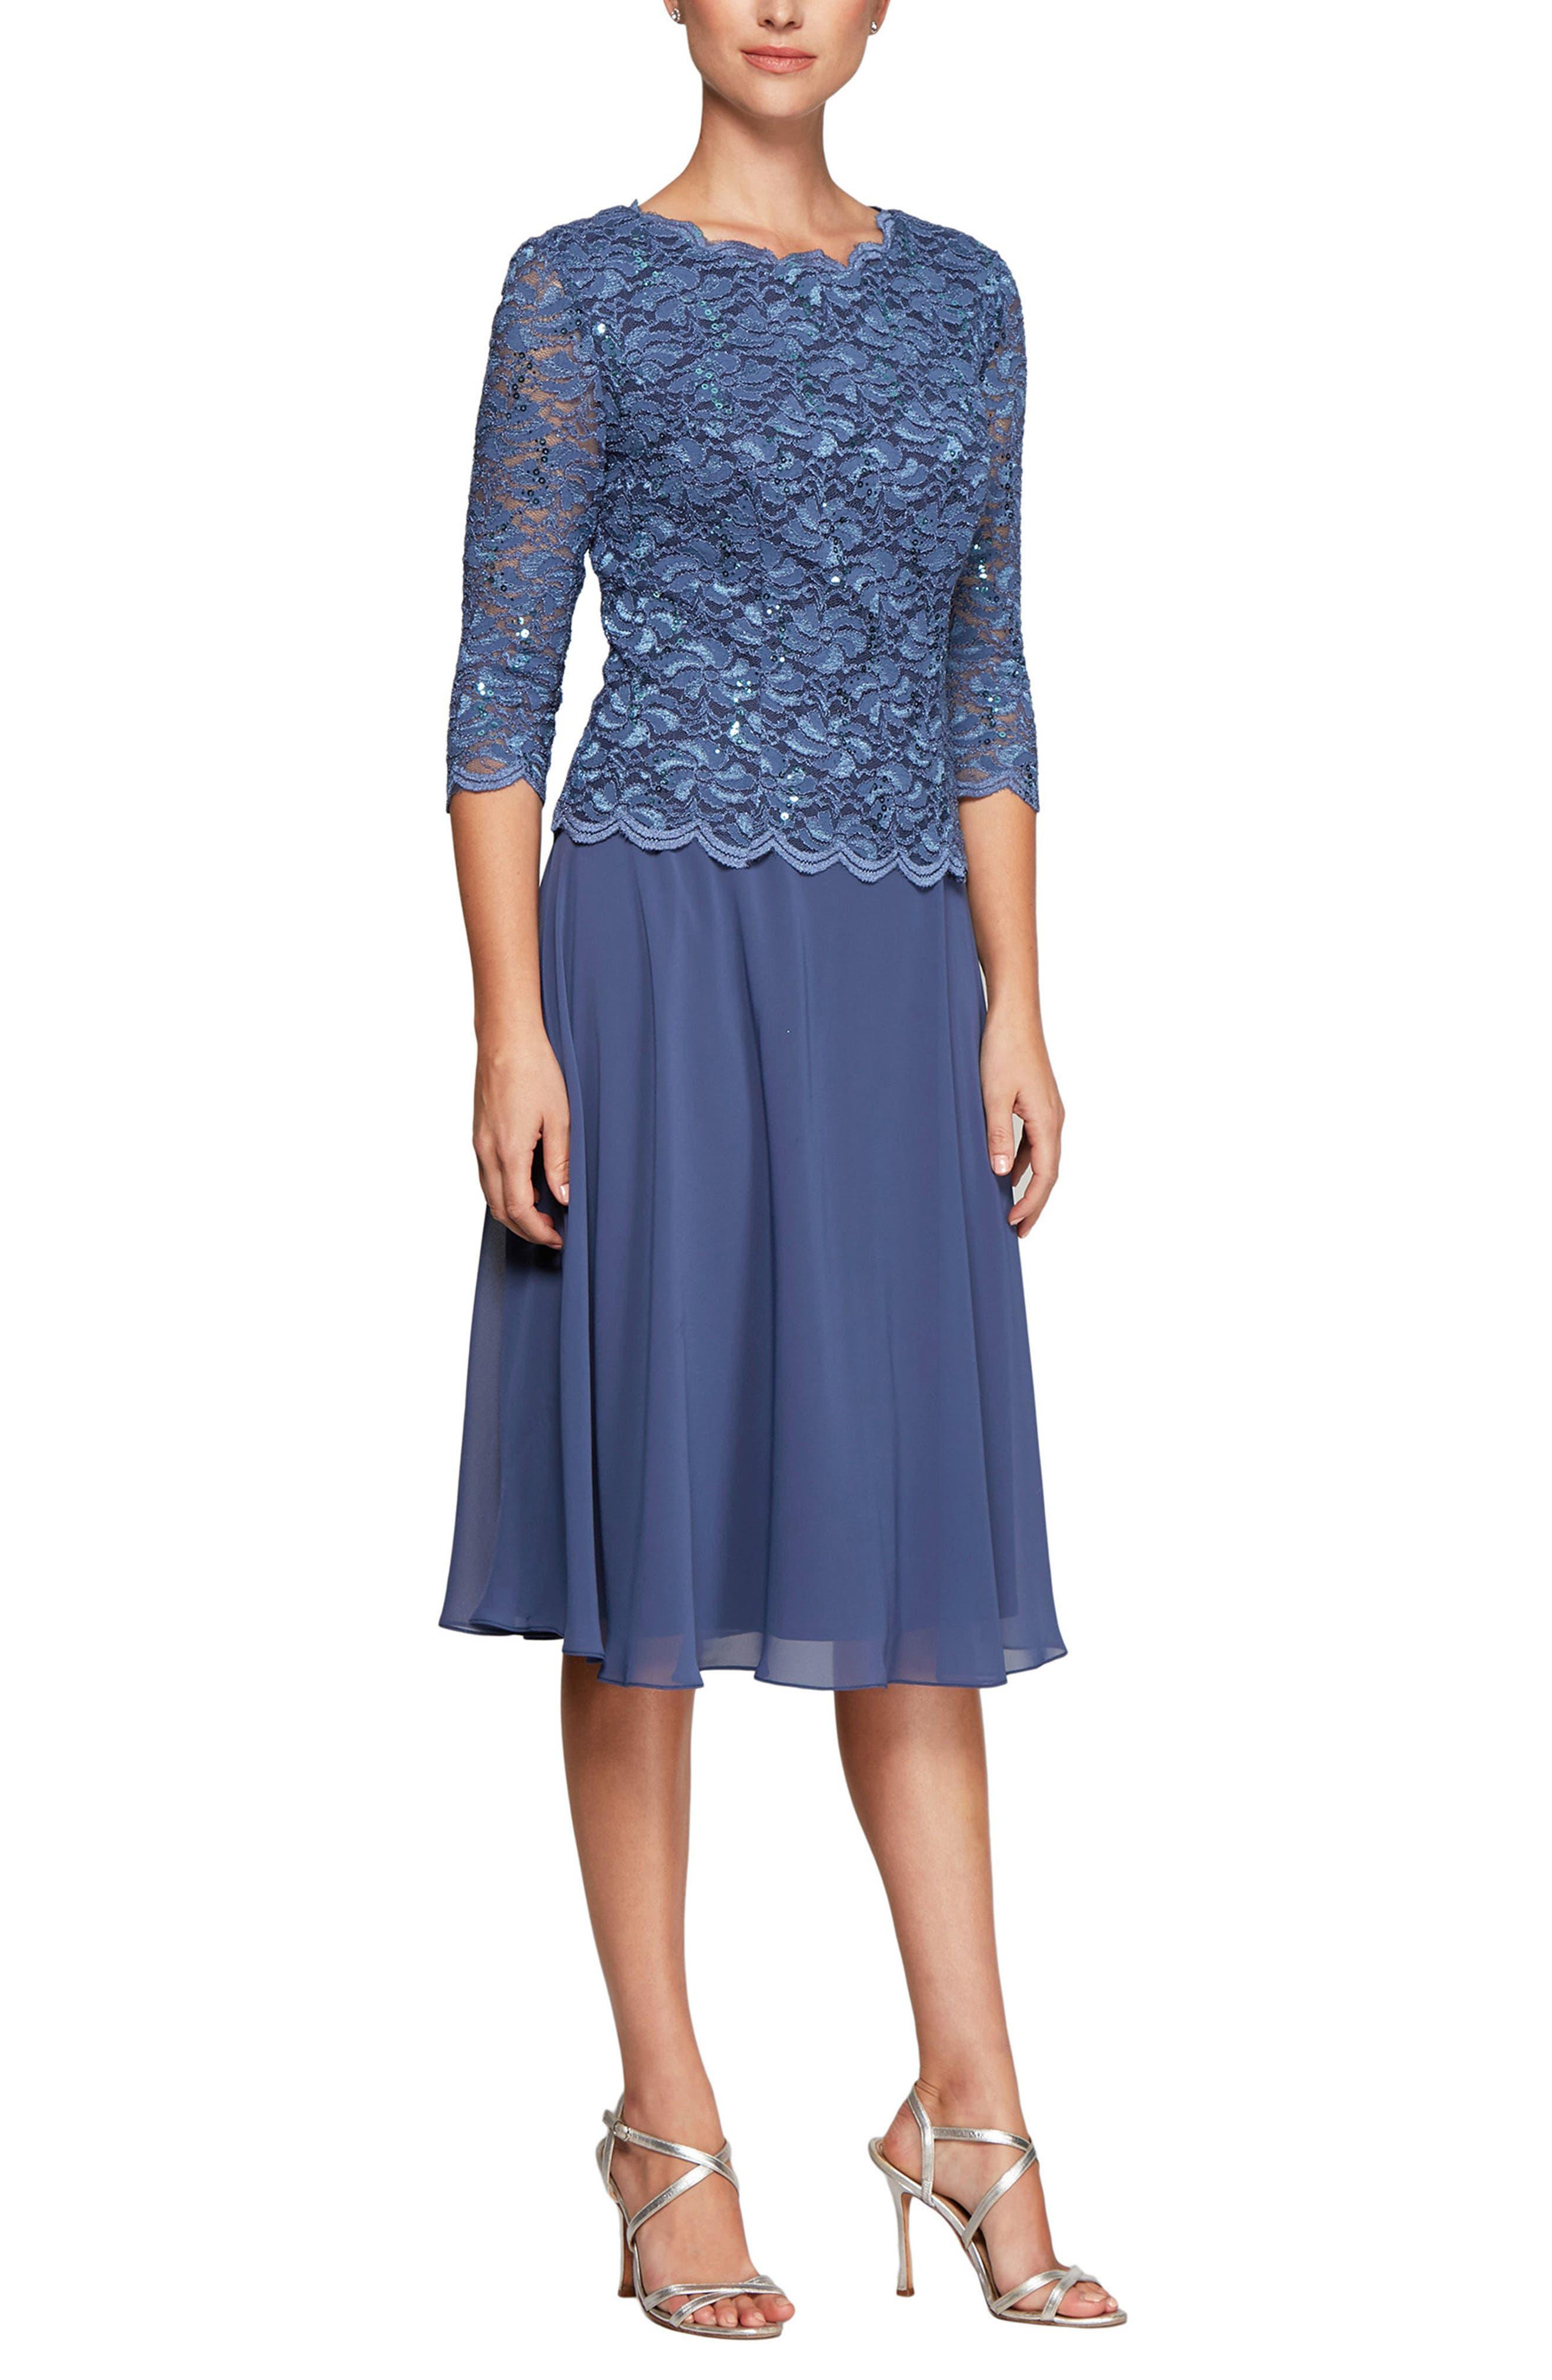 Tea Length Evening Dresses Dillard's